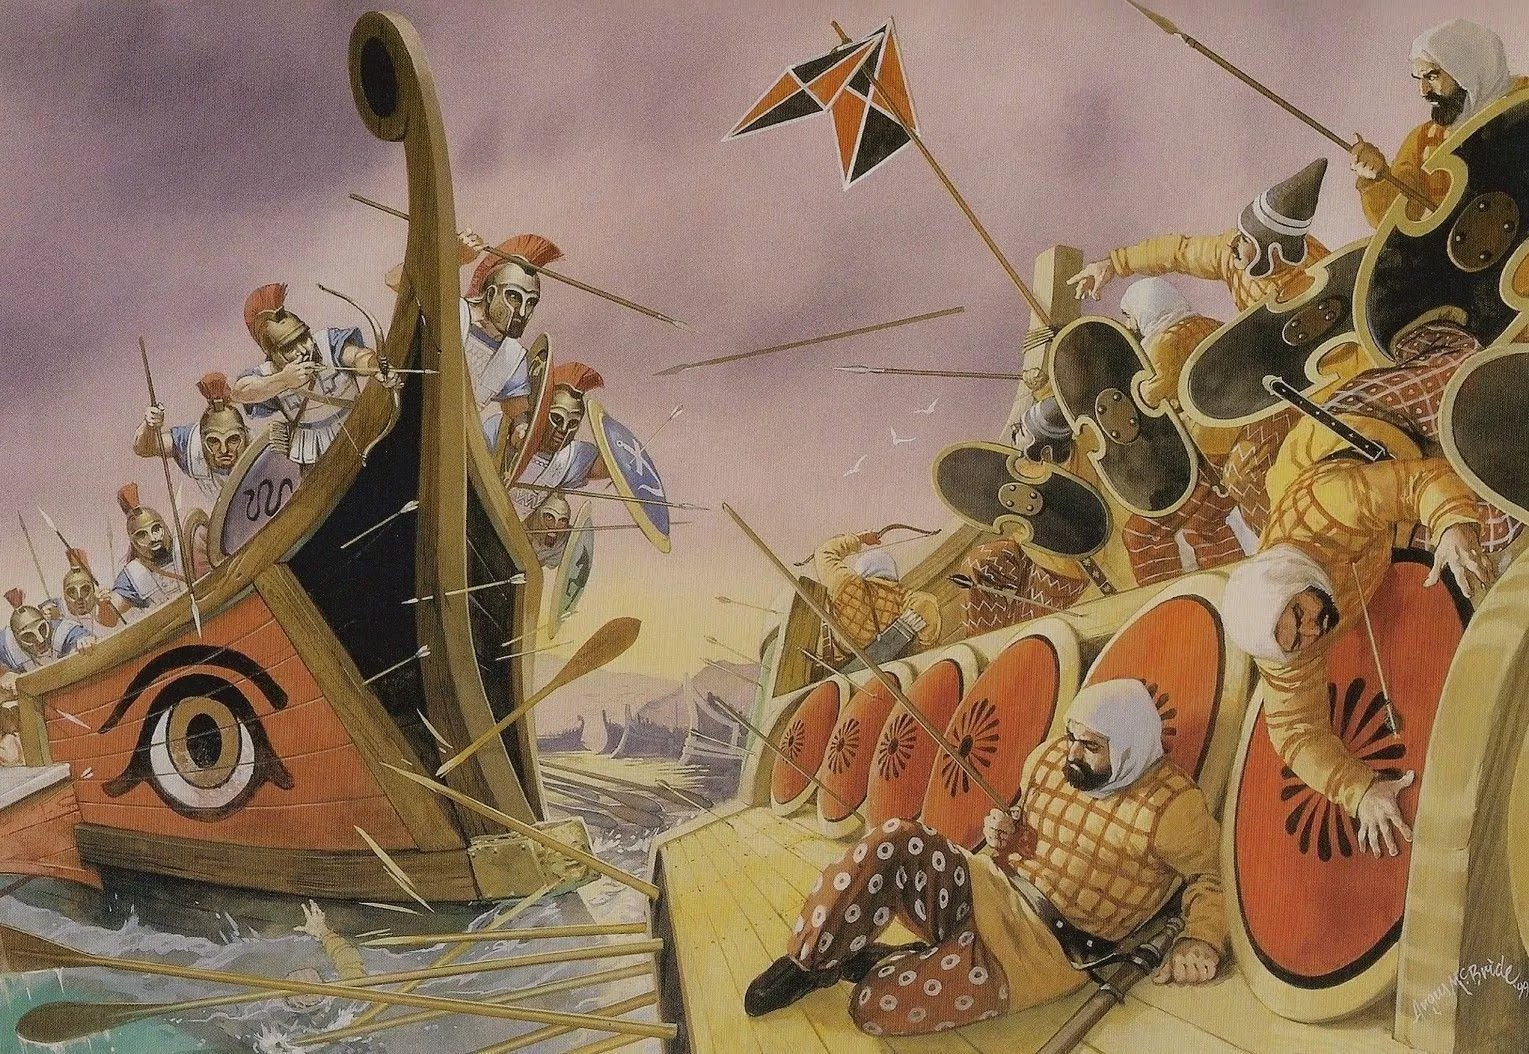 Batle of Salamis